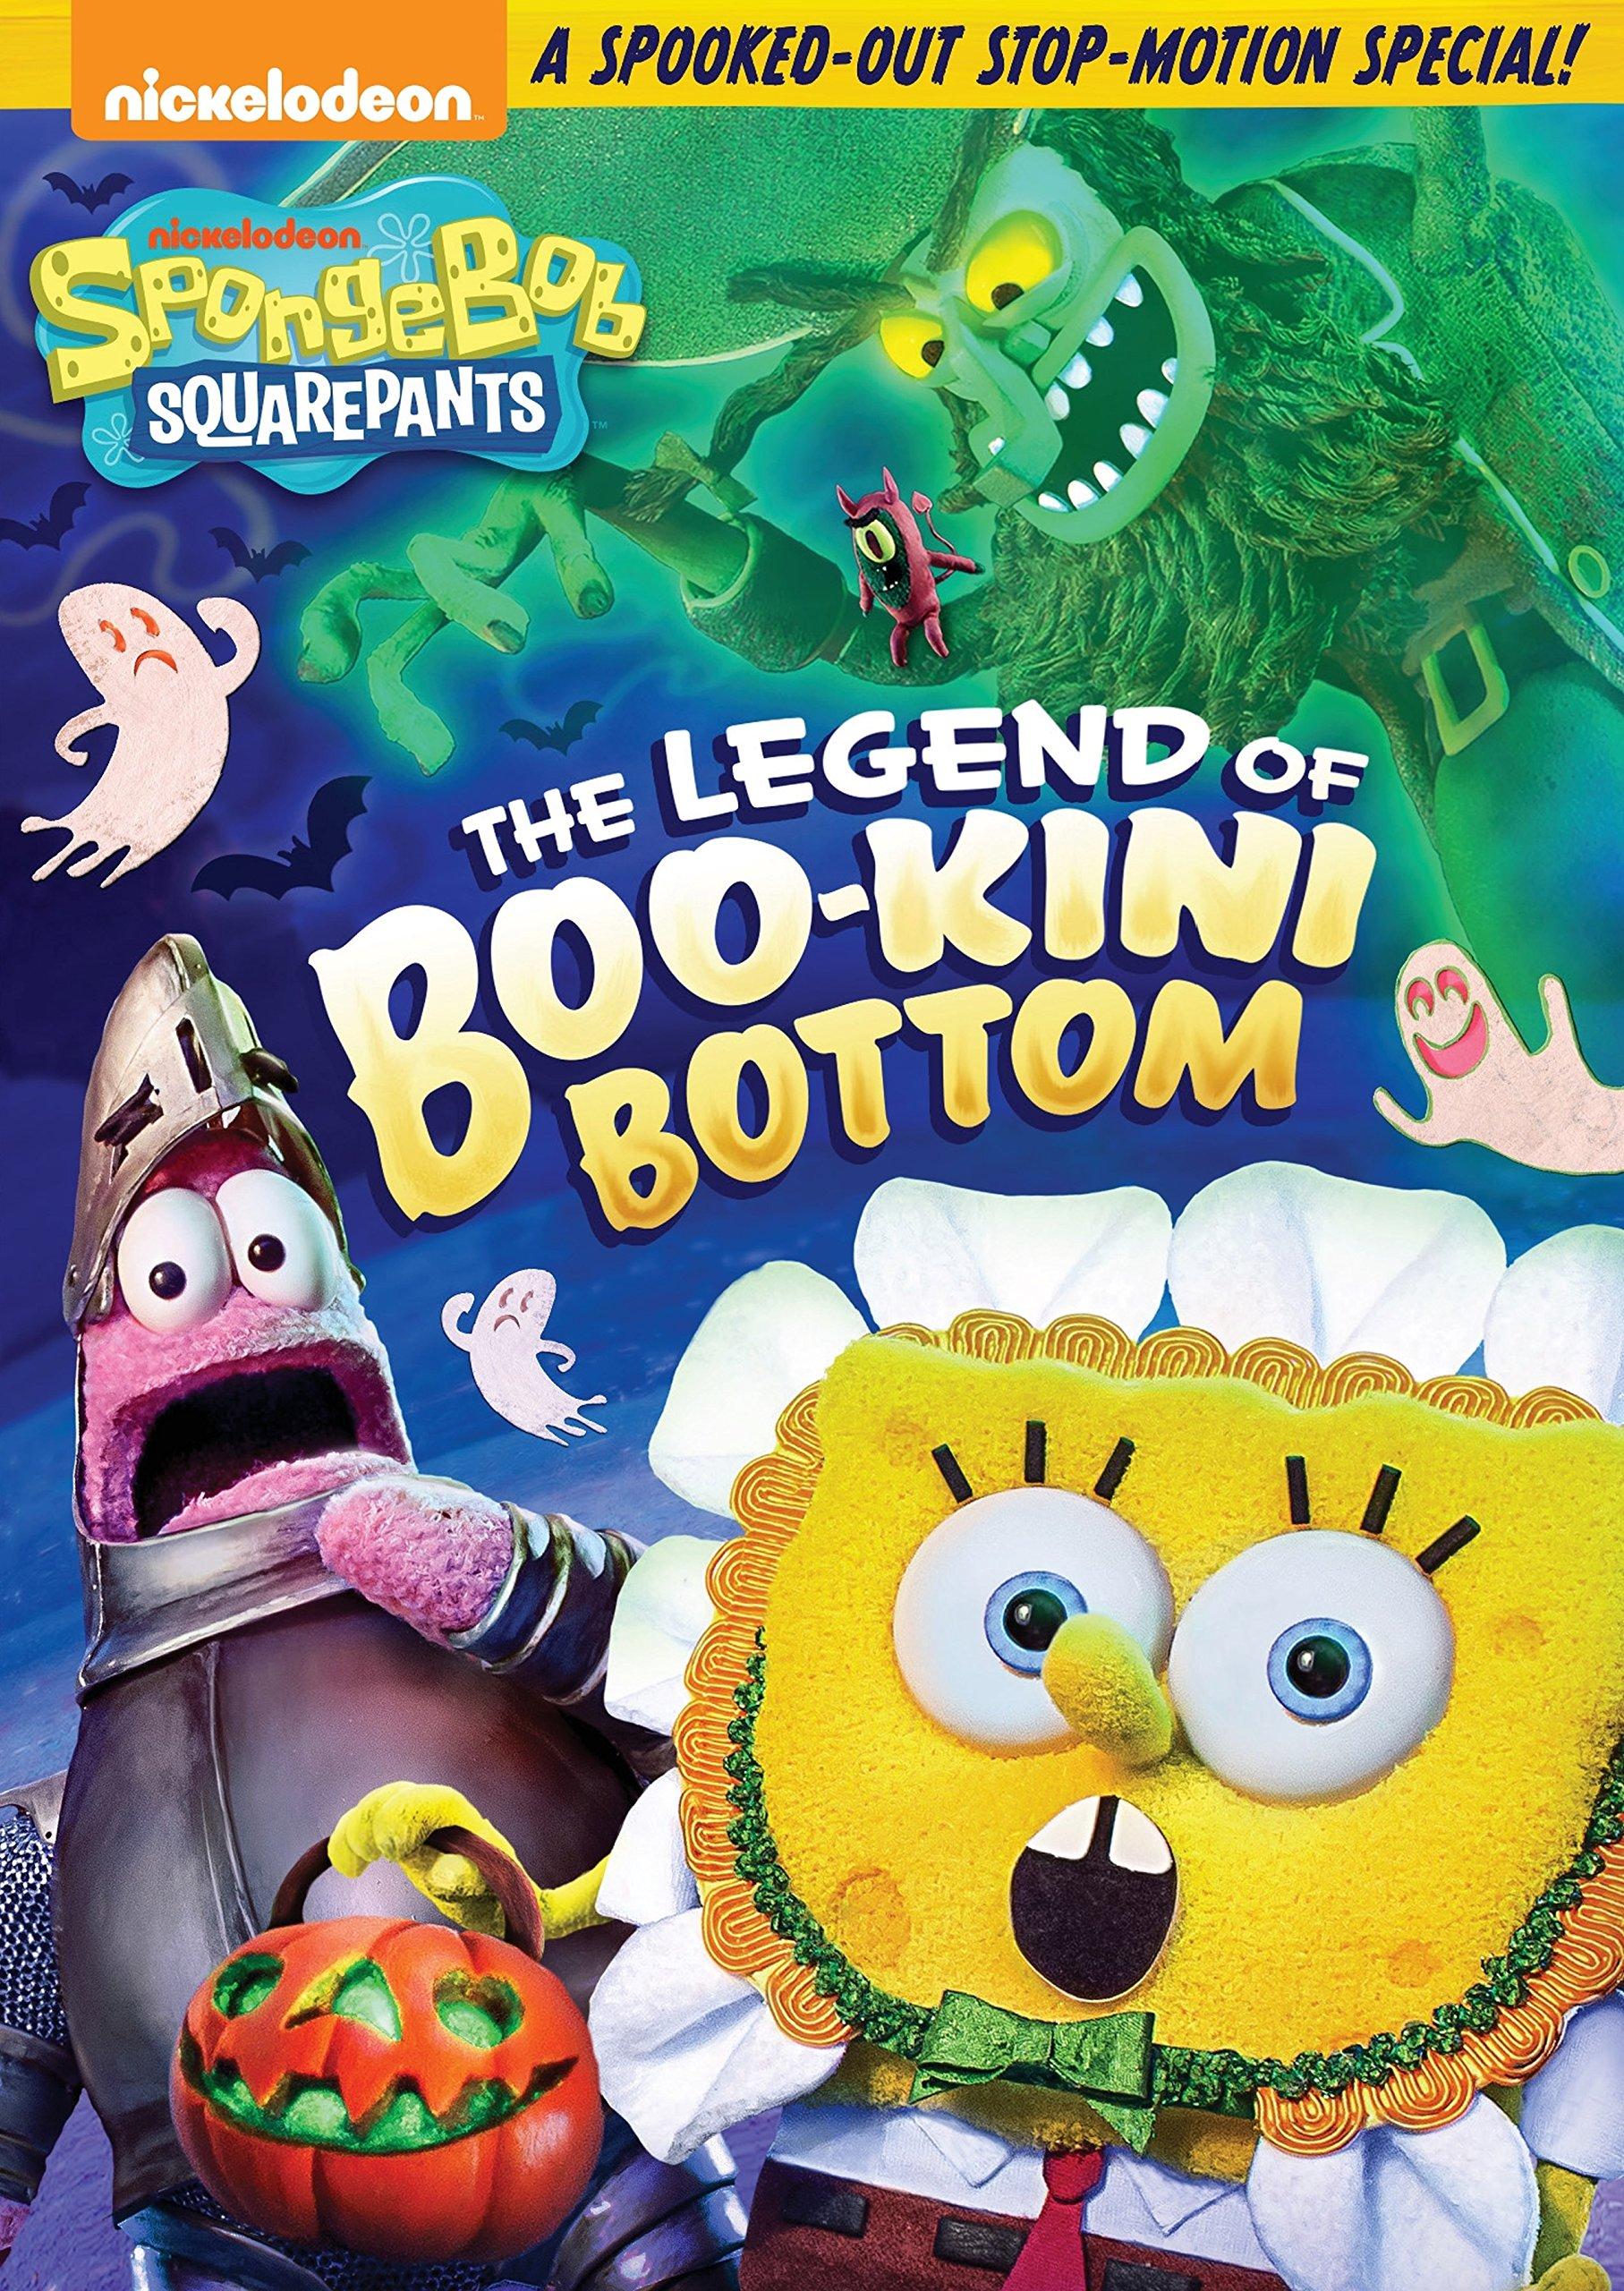 DVD : Spongebob Squarepants: The Legend Of Boo-kini Bottom (Amaray Case, Widescreen, Dubbed)